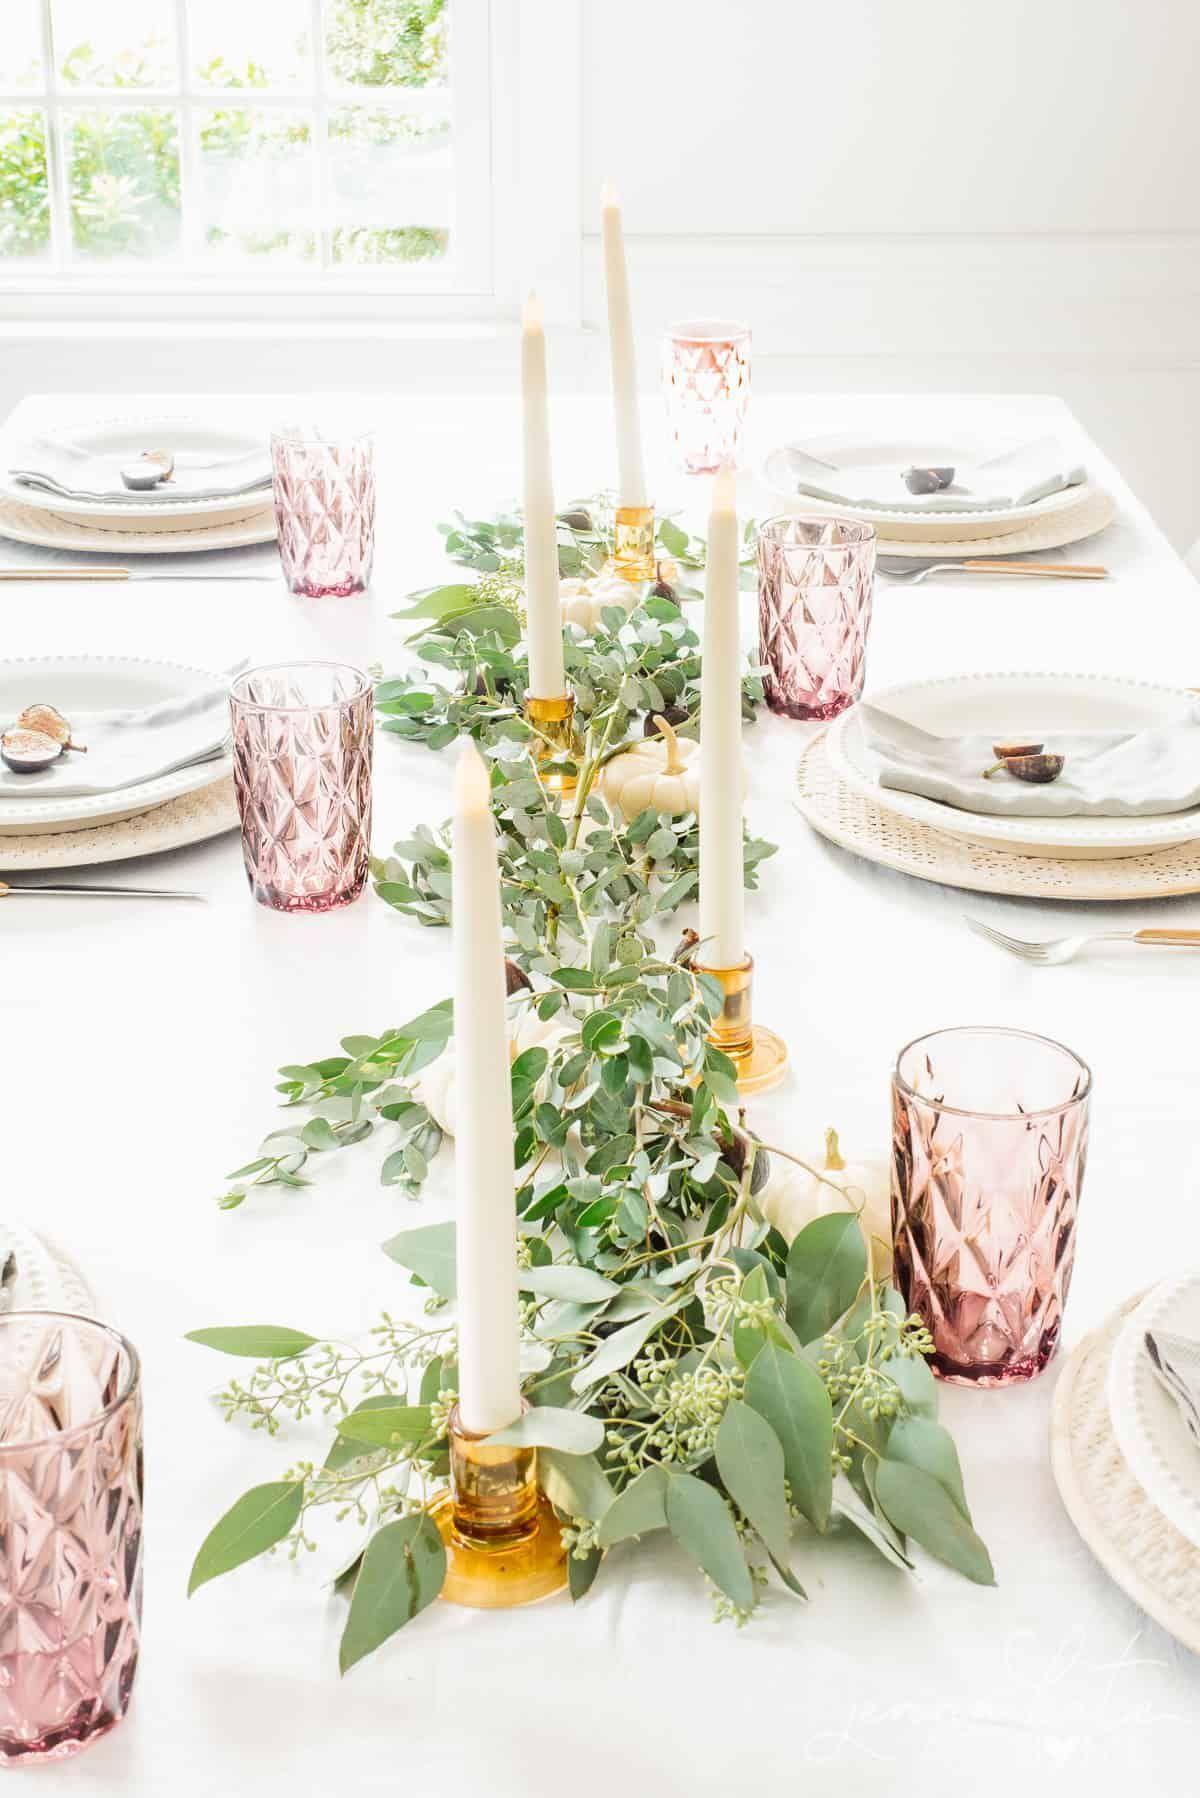 Natural Fall Decorating Ideas Fall Decor Inspired By Nature Fall Decor Fall Table Settings Table Setting Decor